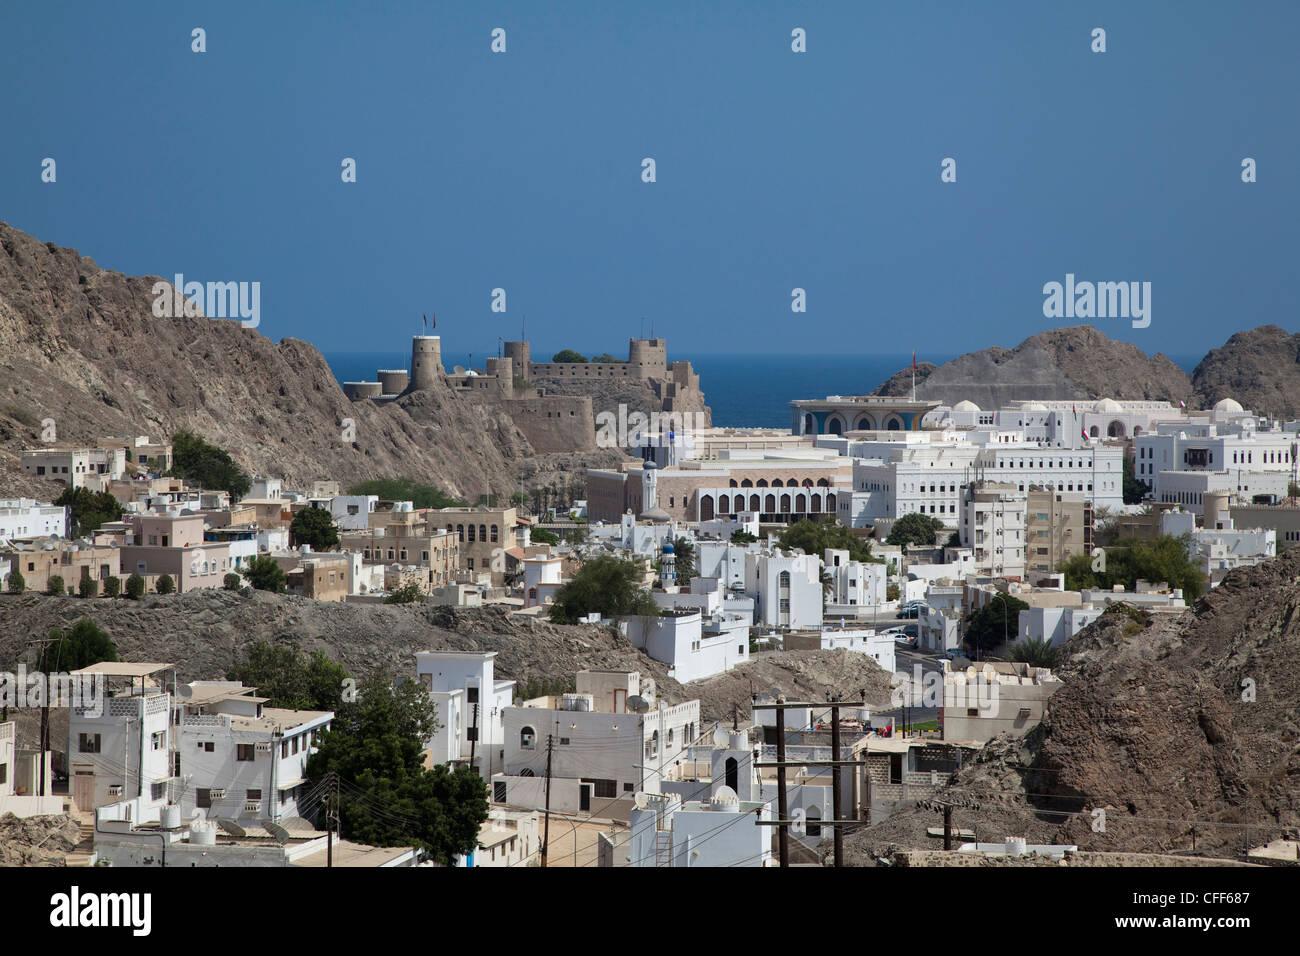 Overhead of Old Muscat, Muscat, Masqat, Oman, Arabian Peninsula - Stock Image